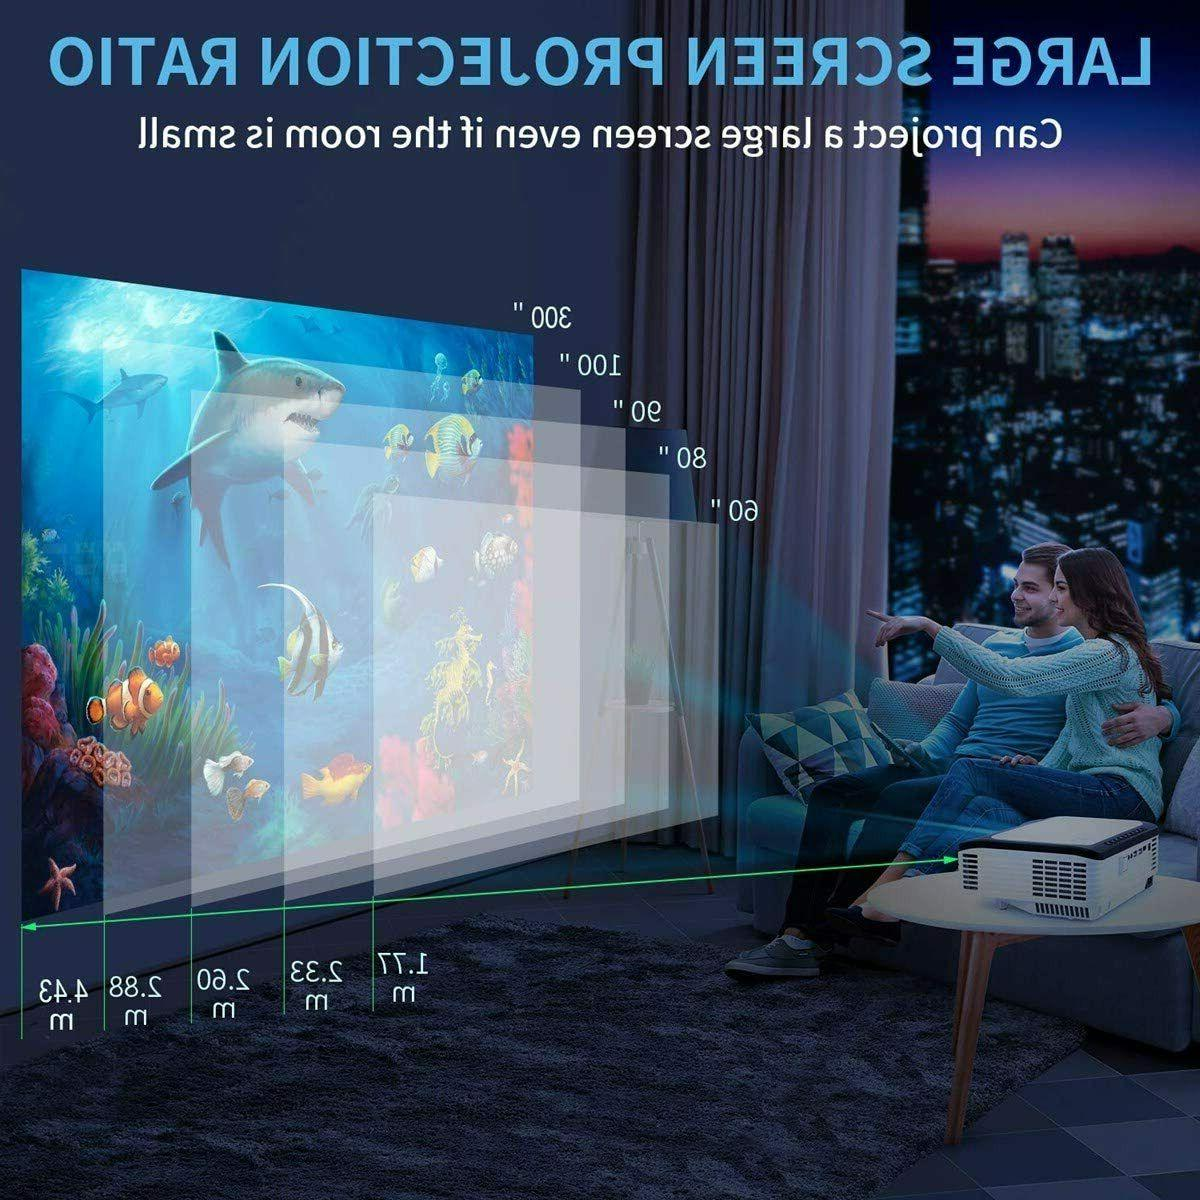 Full 6000 Lumens Theater Video HDMI